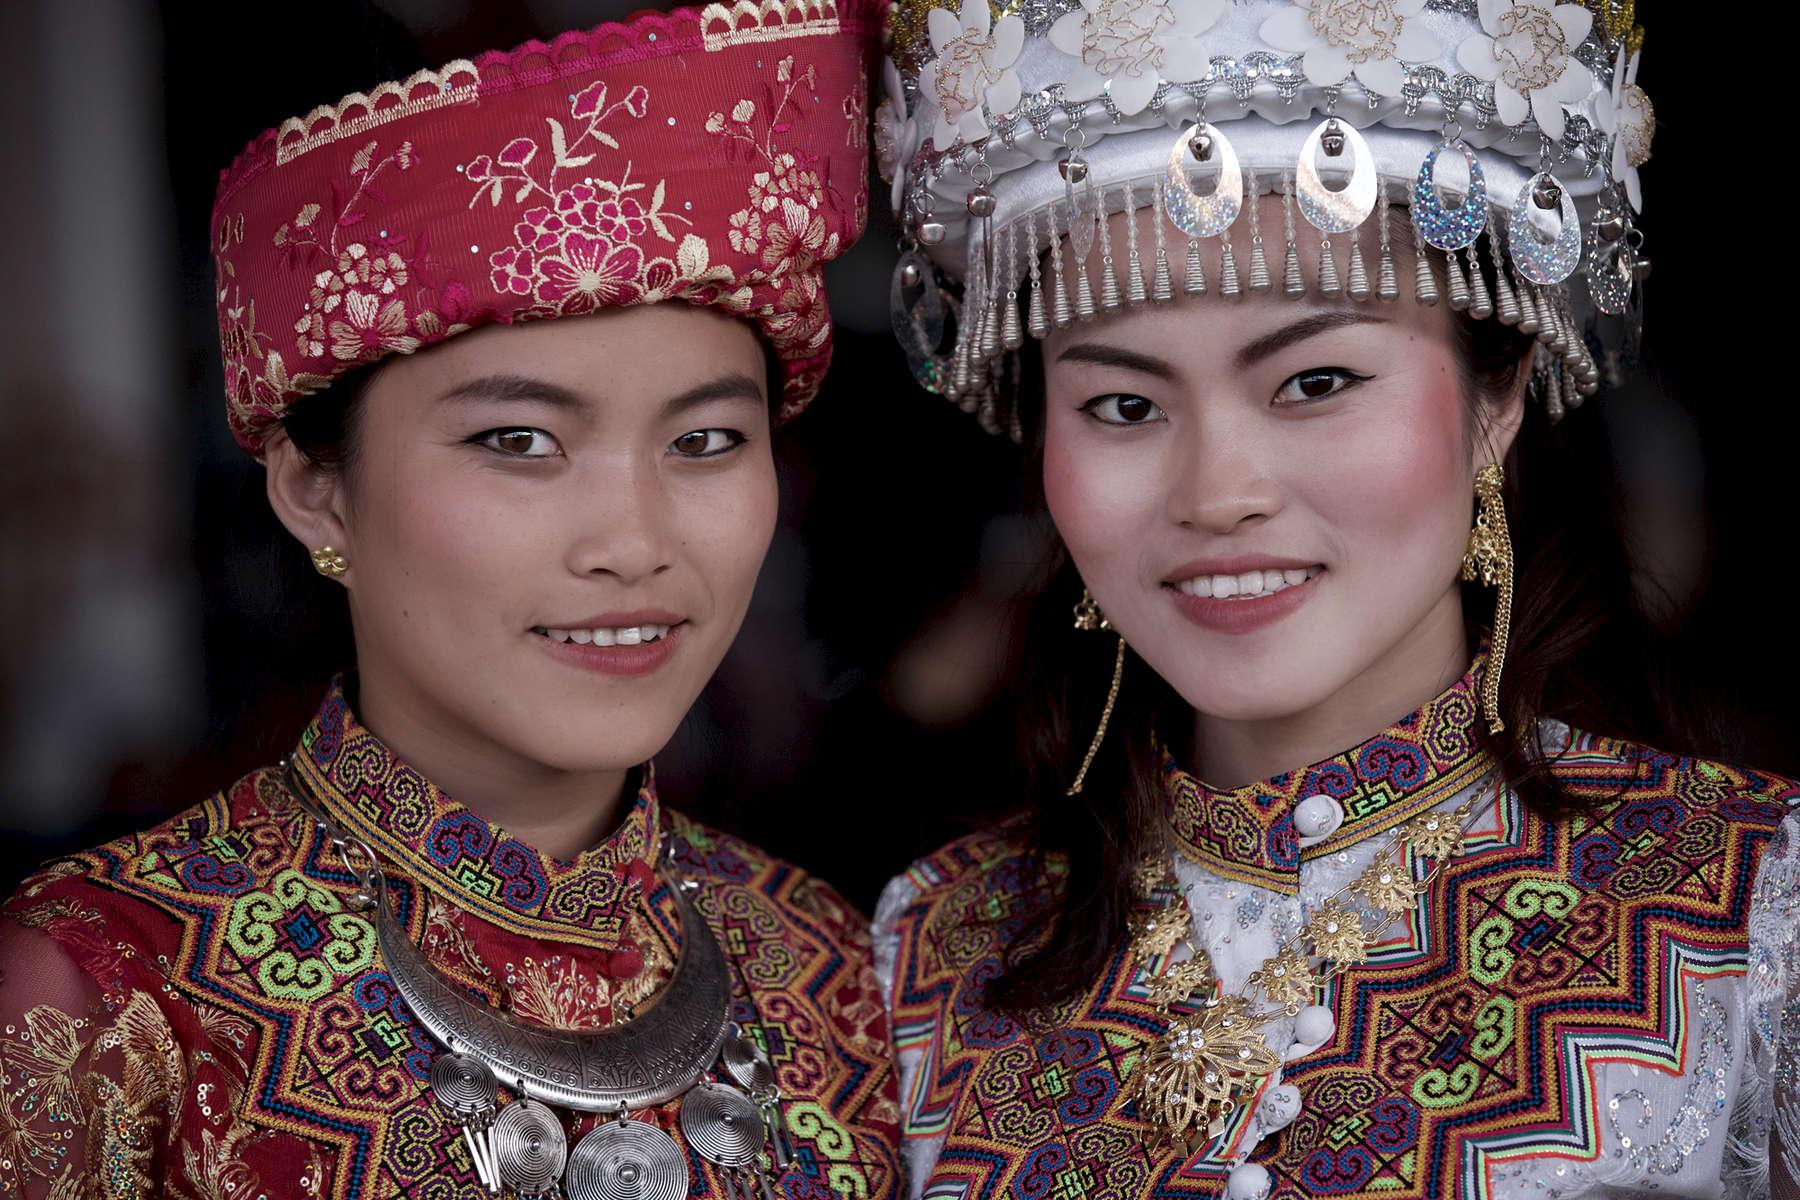 laos-hmong-new-year-ethnic-minority-photo-by-cyril-eberle-CEB_6623-web